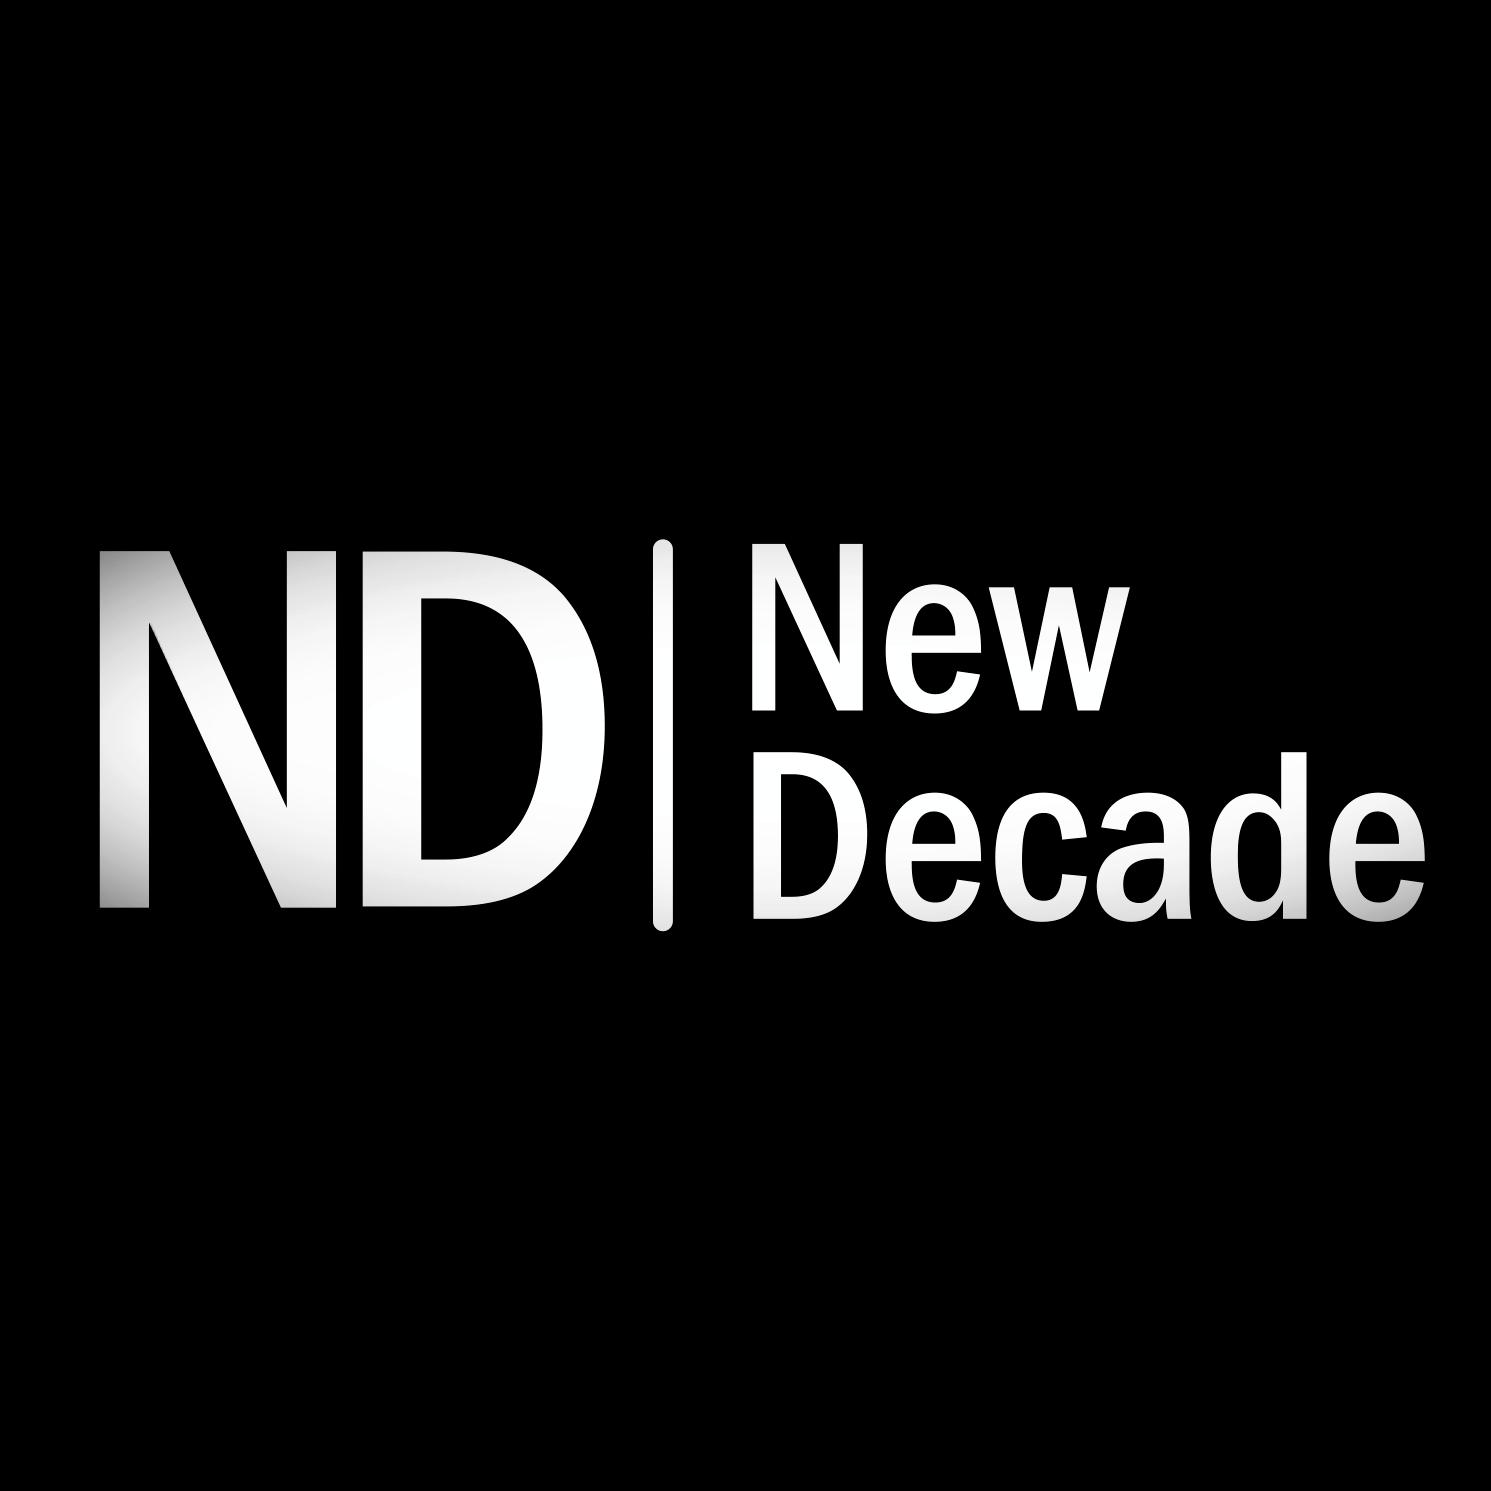 New Decade TV